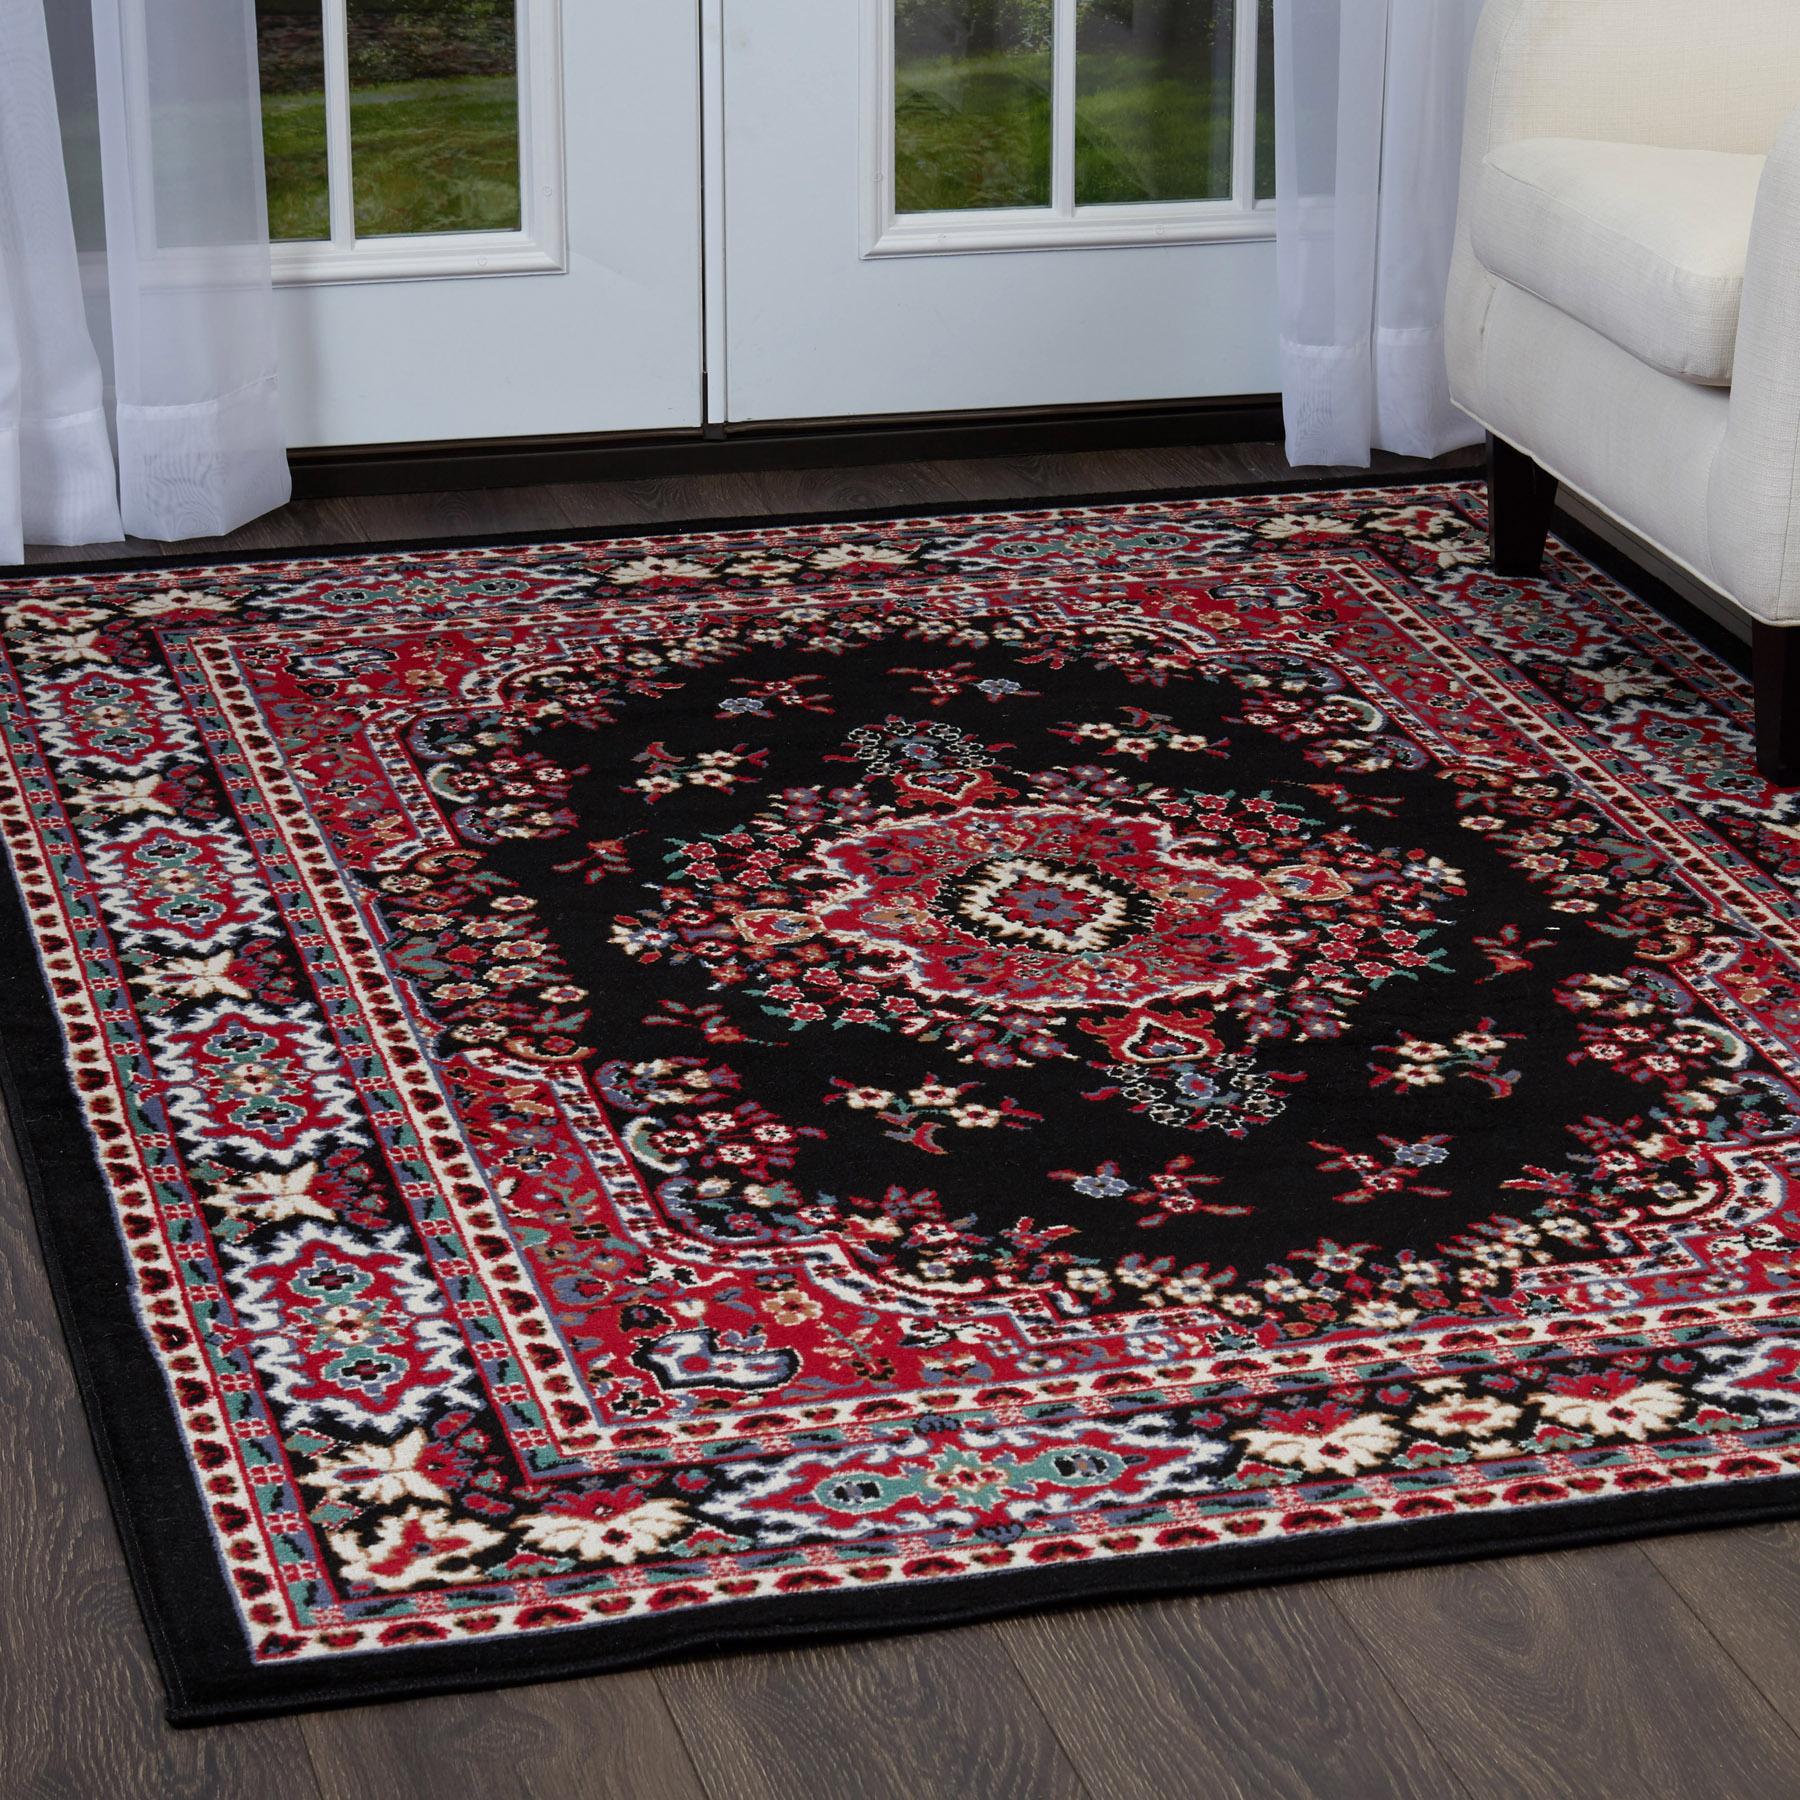 Details About Persien Black Area Rug 2 X 8 Runner Oriental Carpet 69 Actual 1 10 X 7 3